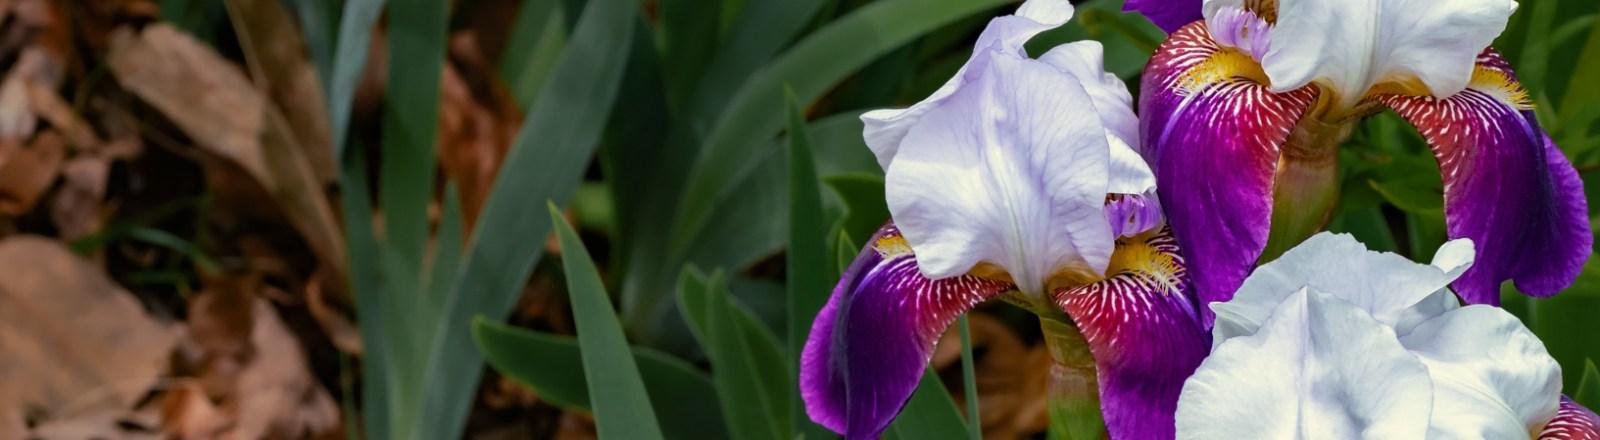 Bearded Irises: White Standards, Purple Falls (1 of 3)